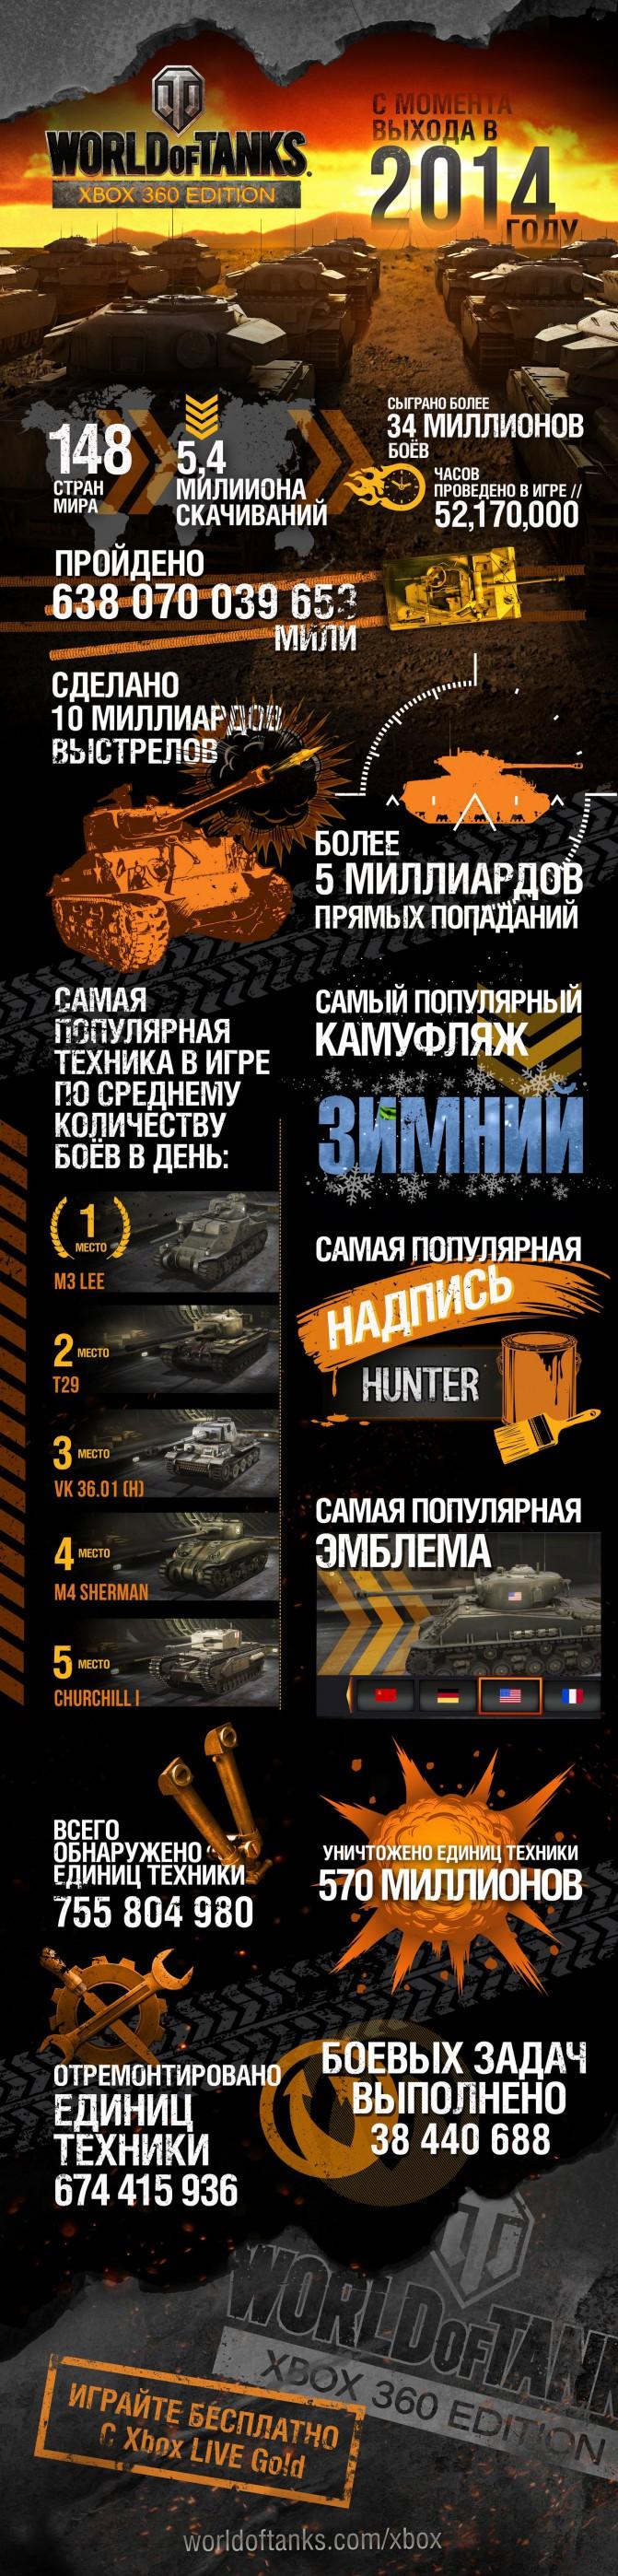 WoT_Xbox_360_Edition_1_Year_Anniversary_Infographics_RU